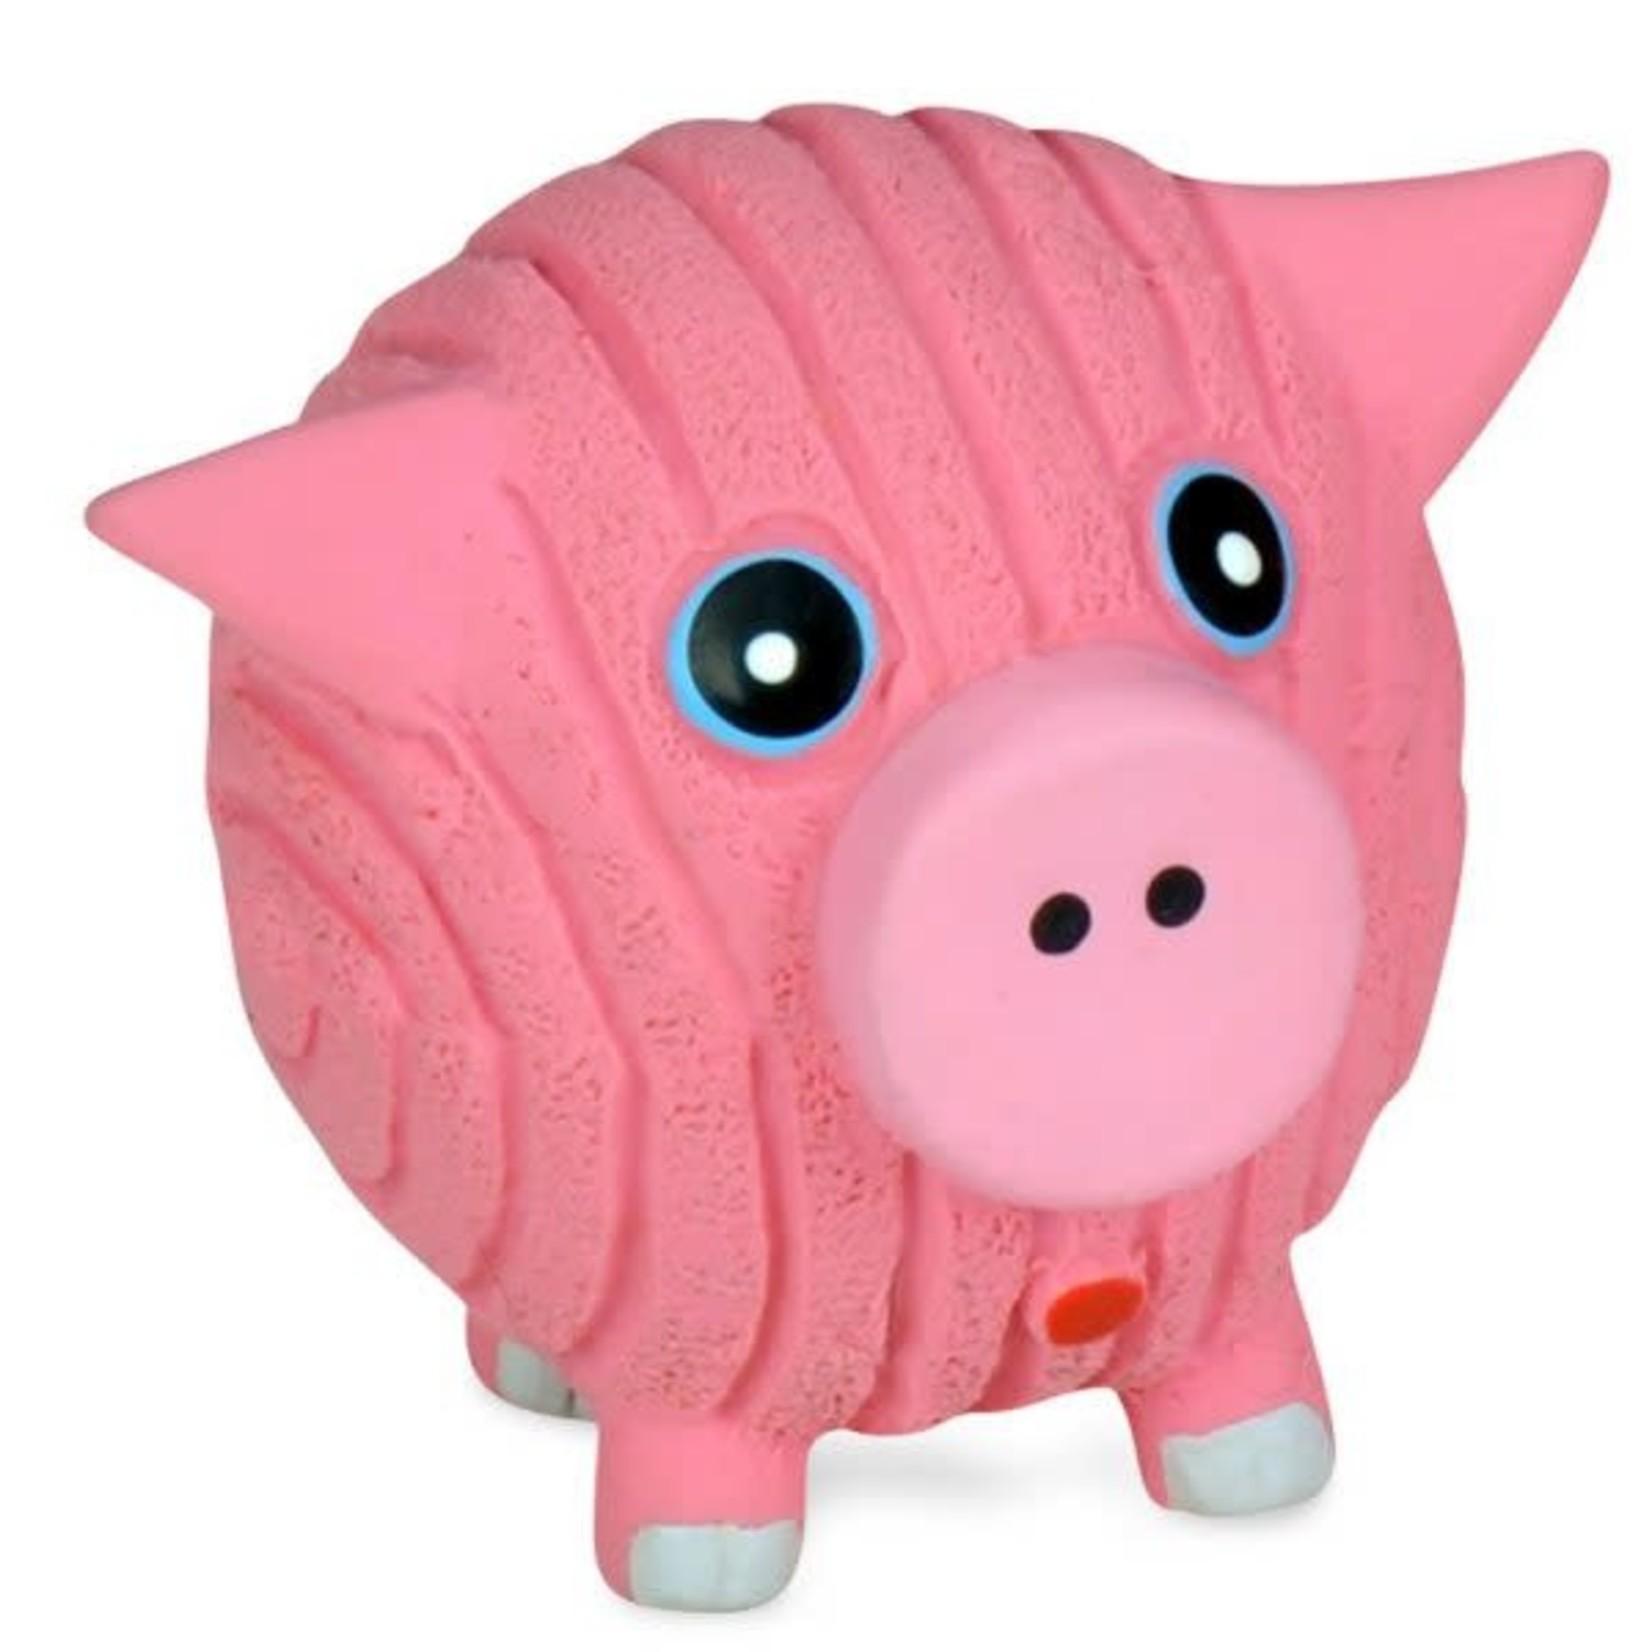 Hugglehounds HH Ruff-Tex Hamlet the Pig Toy Dog Lrg